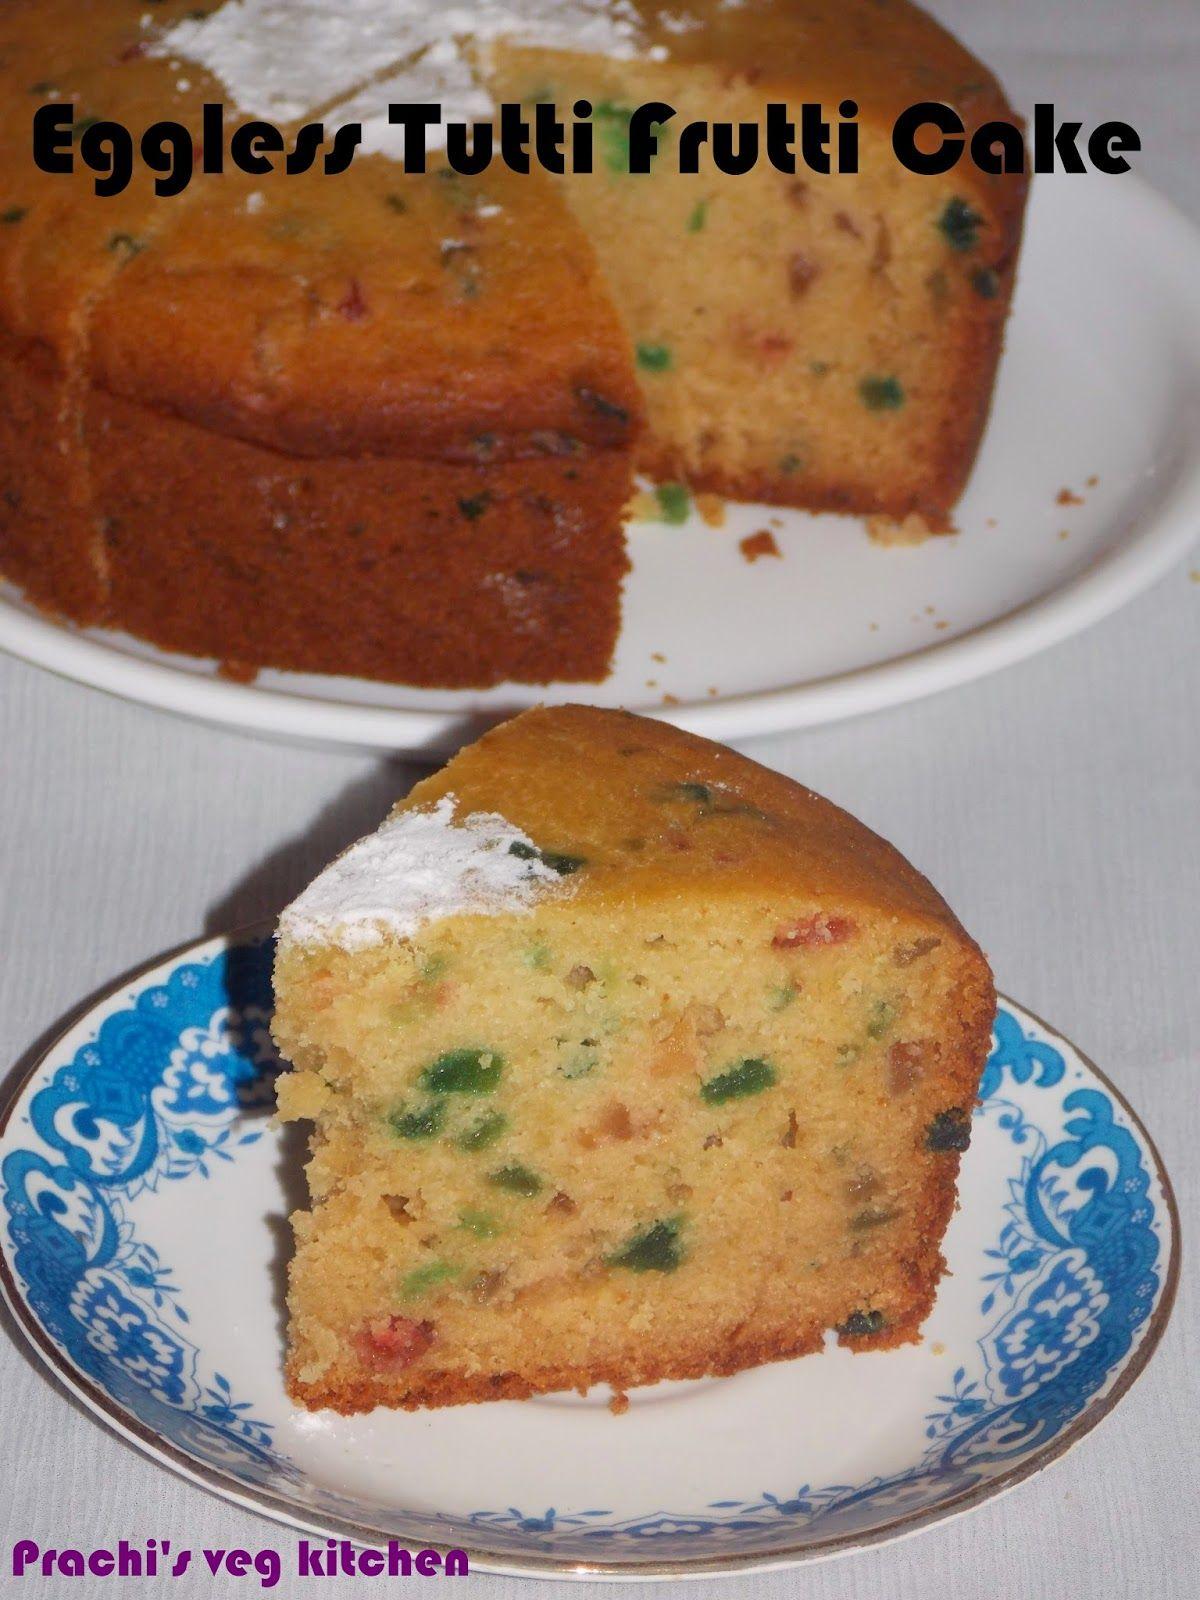 Prachi S Veg Kitchen Eggless Tuffi Frutti Cake No Butter No Condensed Milk Without Oven Cake Cake Recipes Without Oven Eggless Cake Recipe